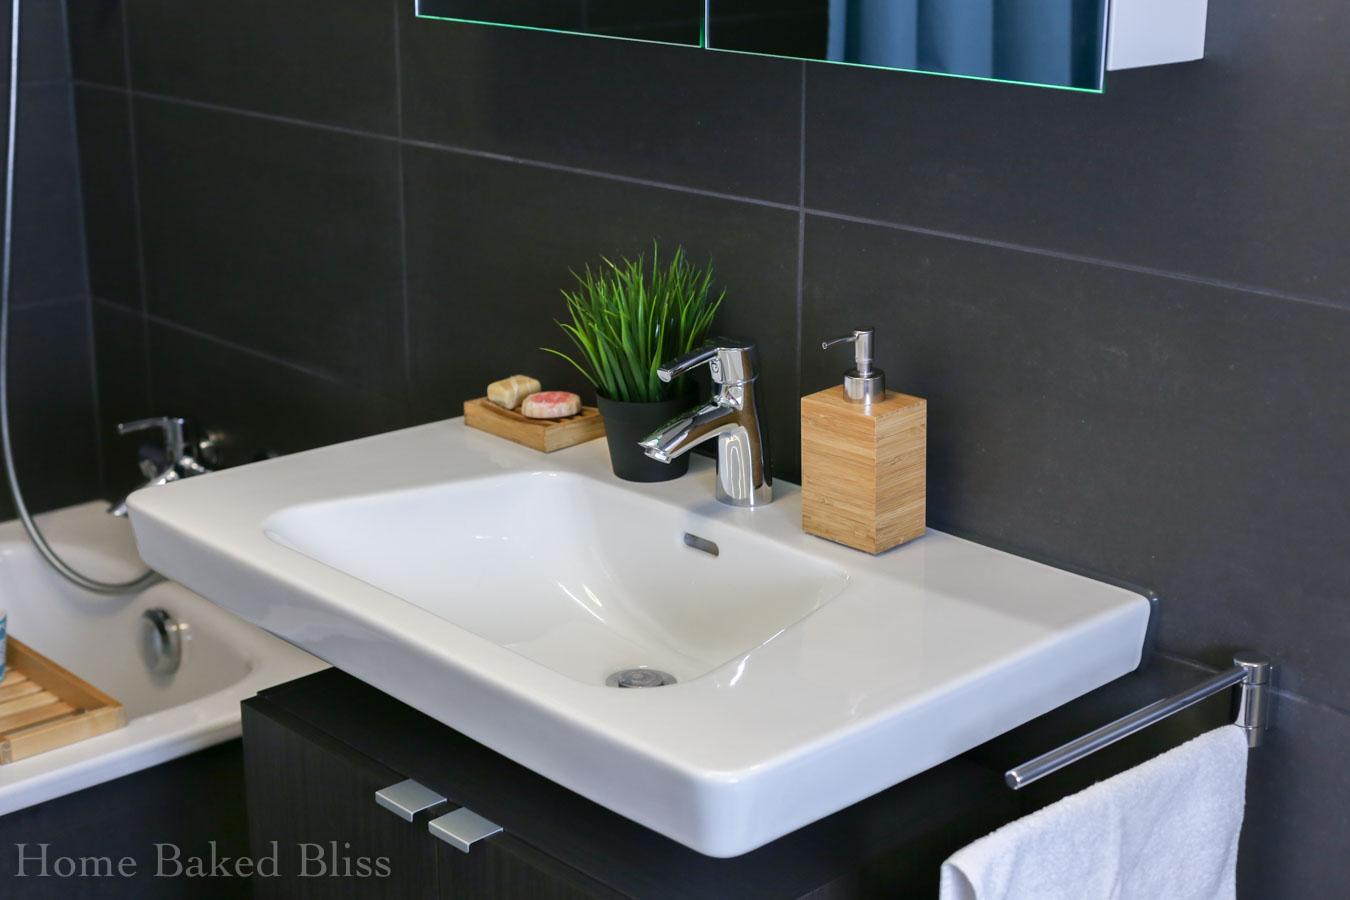 Spa Bathroom, Bathroom, Bathroom Decor, Decorate Bathroom, IKEA Bathroom,  Bamboo Bathroom